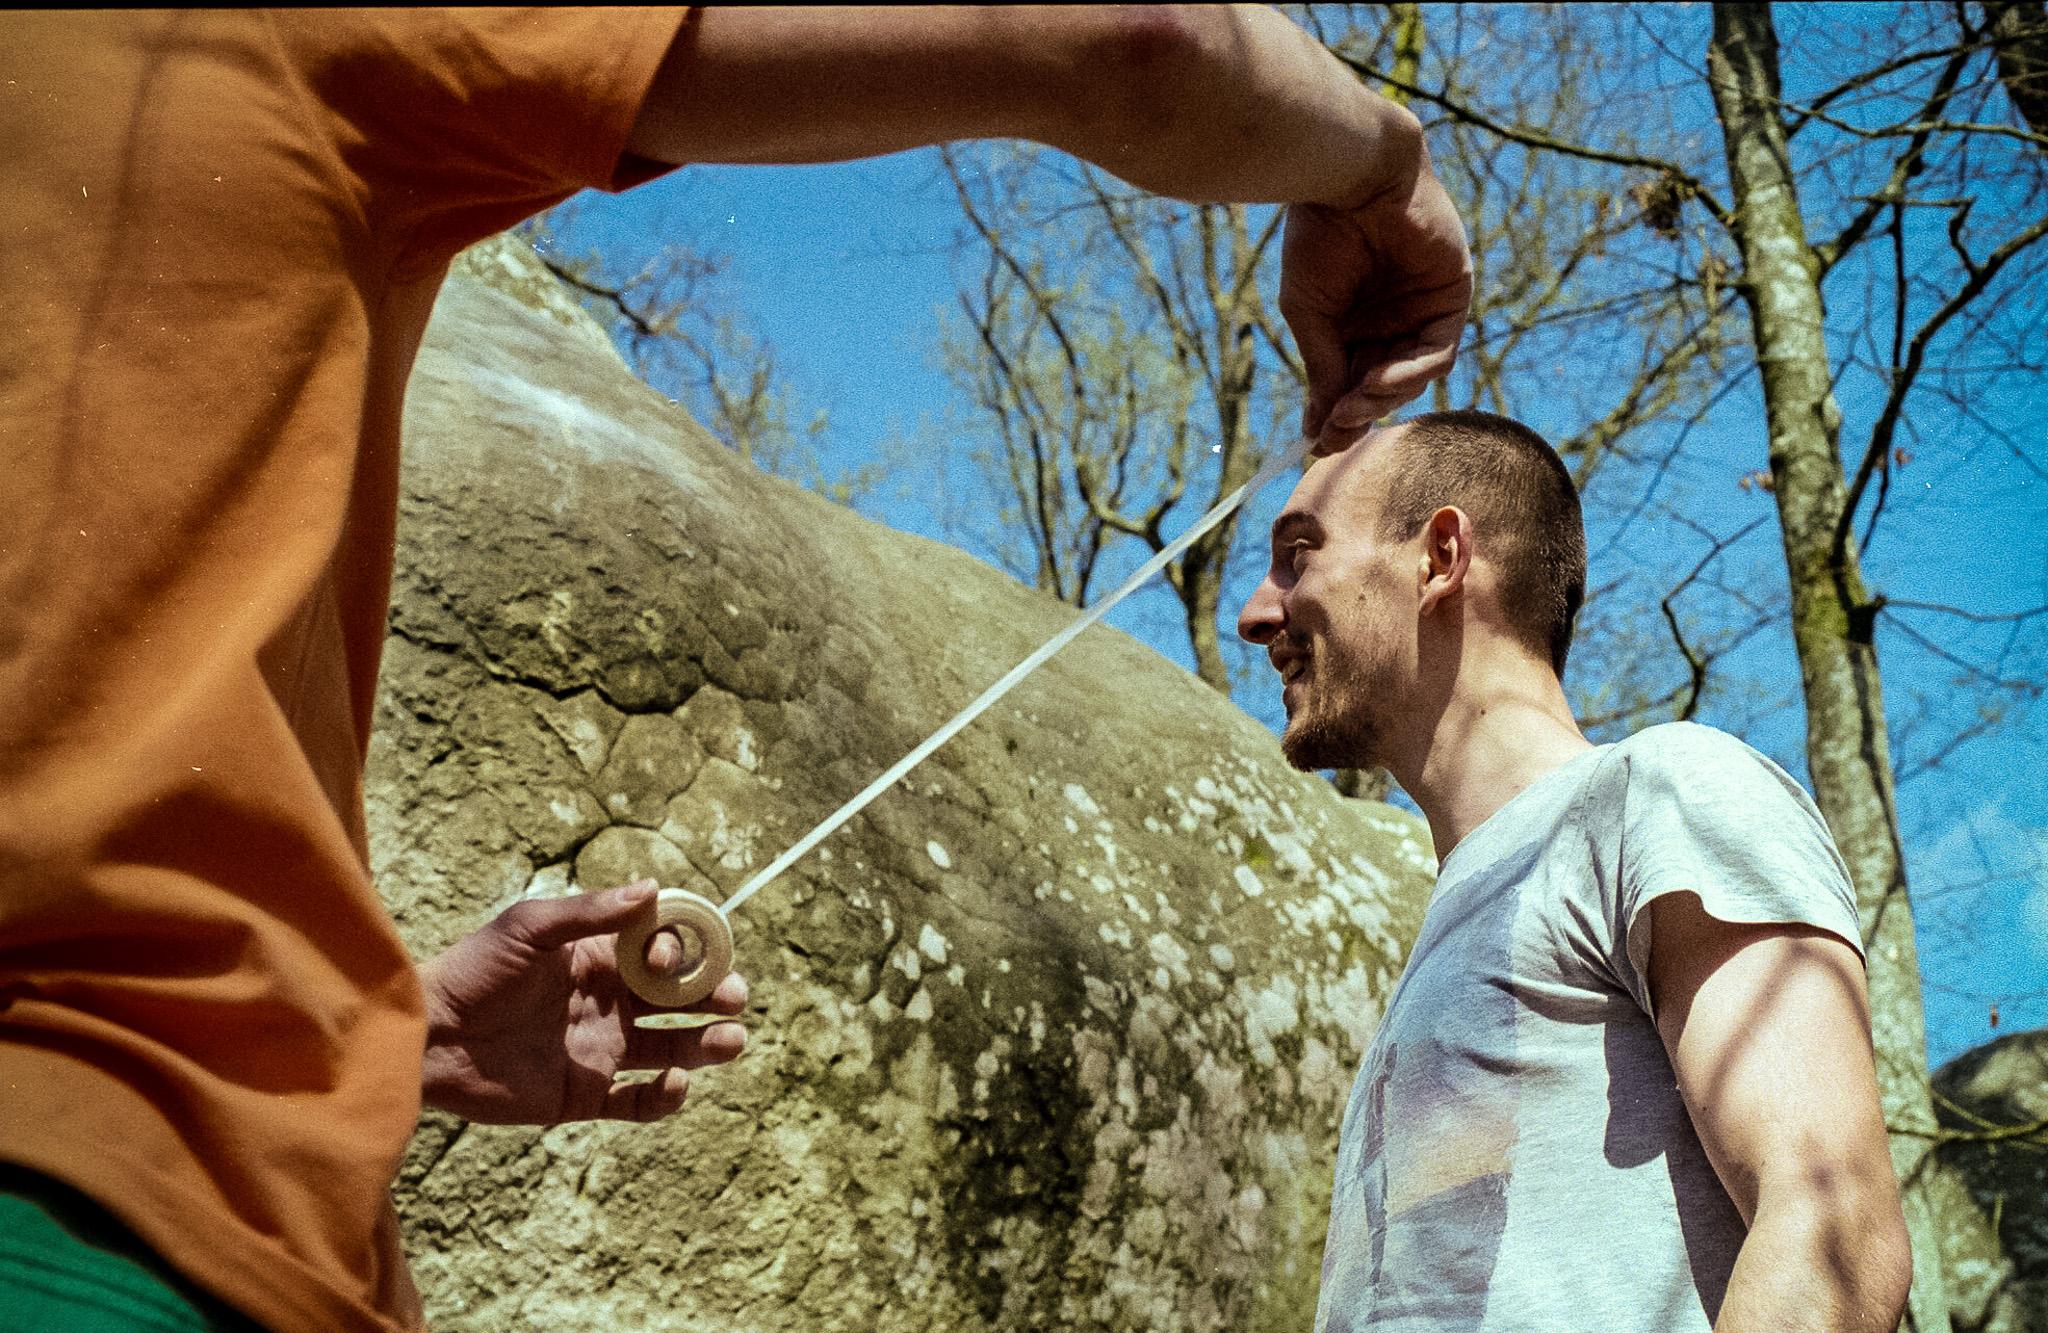 bram-berkien-fontainebleau-on-film-06.jpg